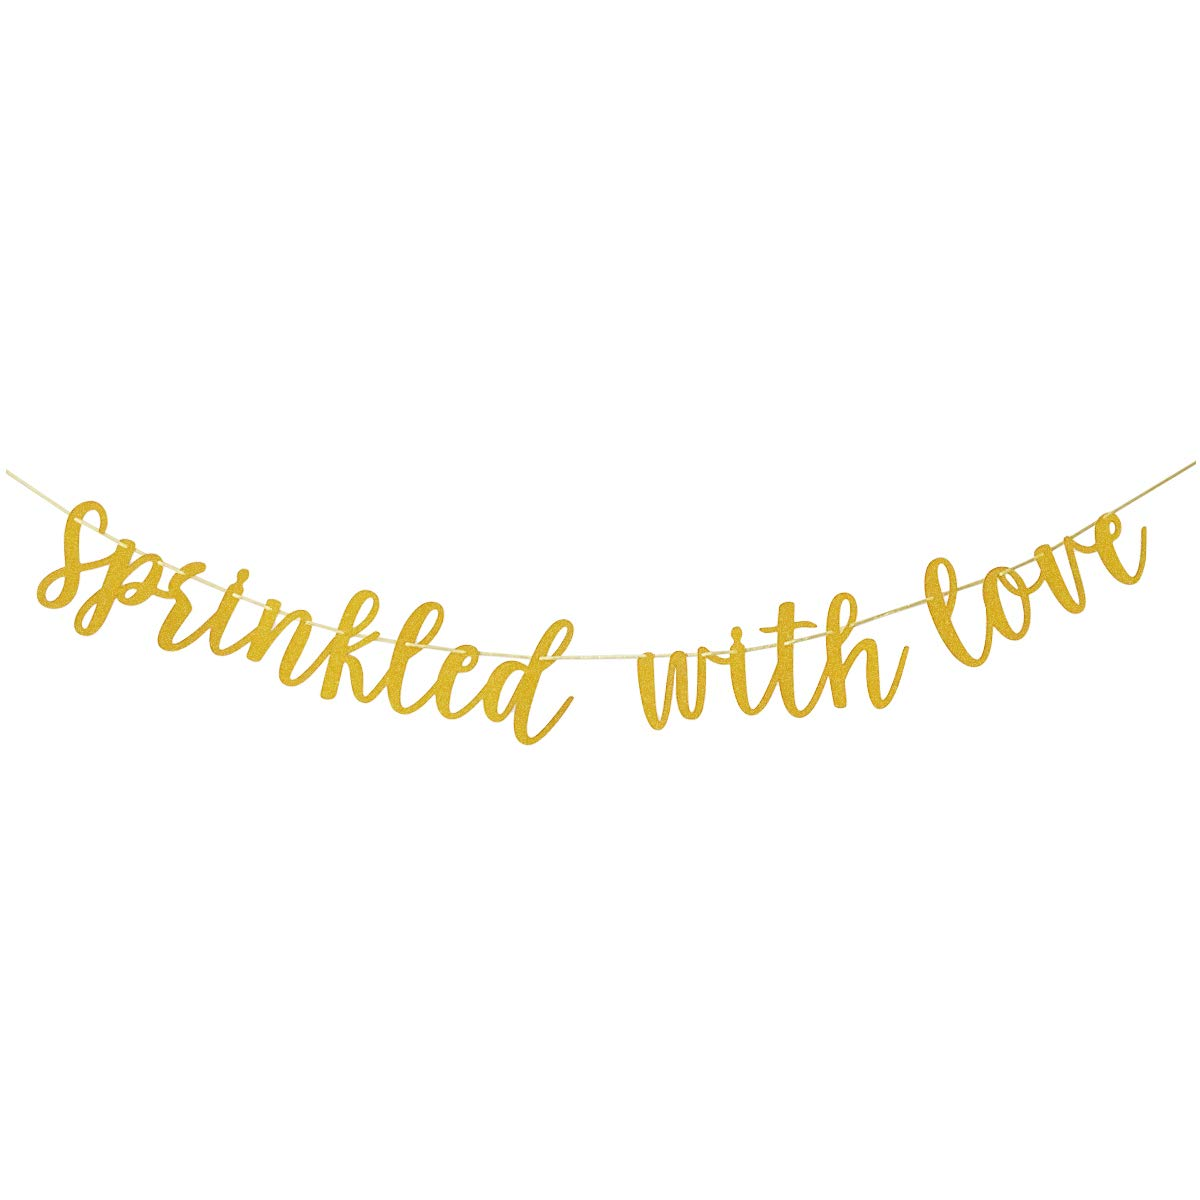 Finseng Sprinkled With Love Gold Glitter Banner Sign Garland for Baby Sprinkle,Baby Shower Decorations